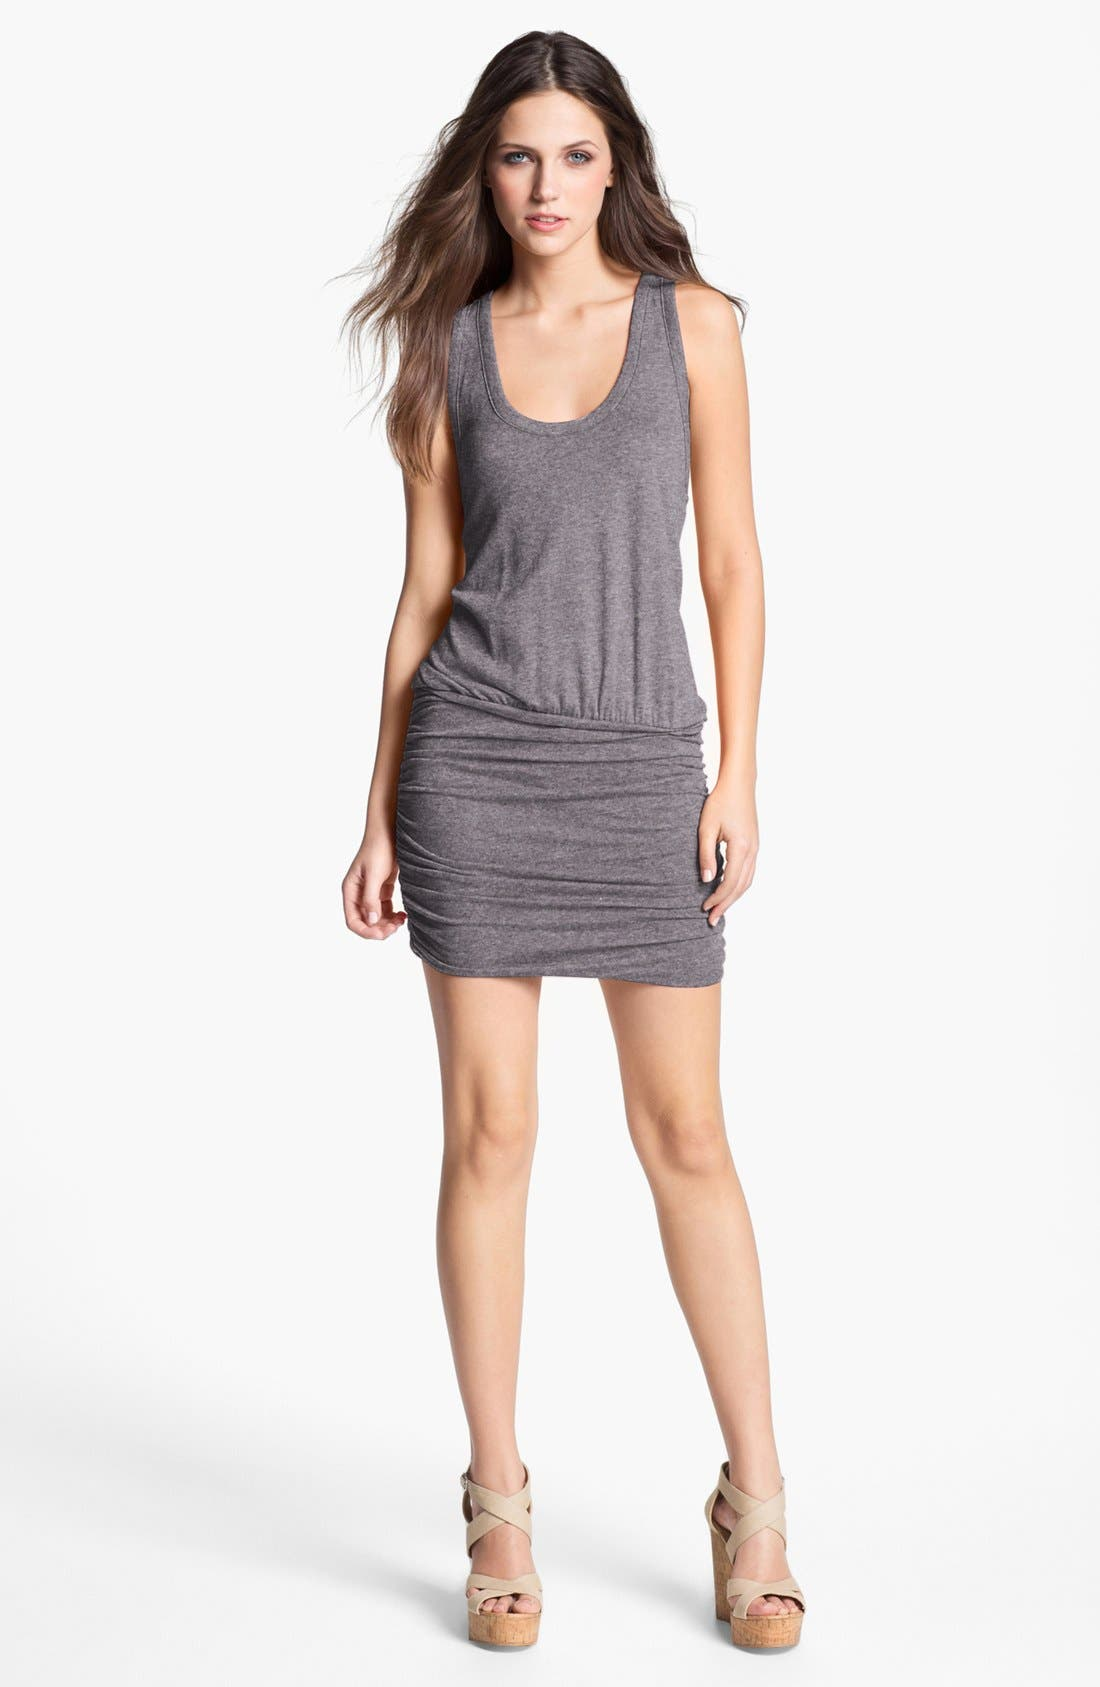 Alternate Image 1 Selected - Soft Joie 'Bond' Ruched Dress